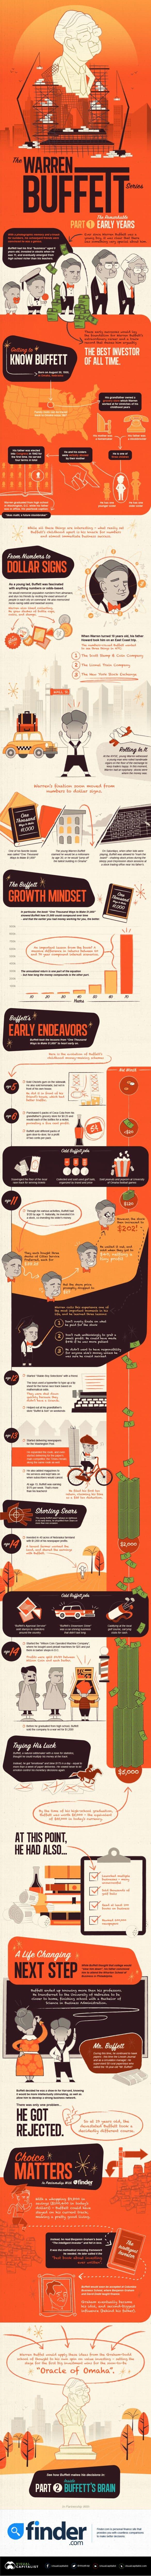 infographic describes warren buffett's early years